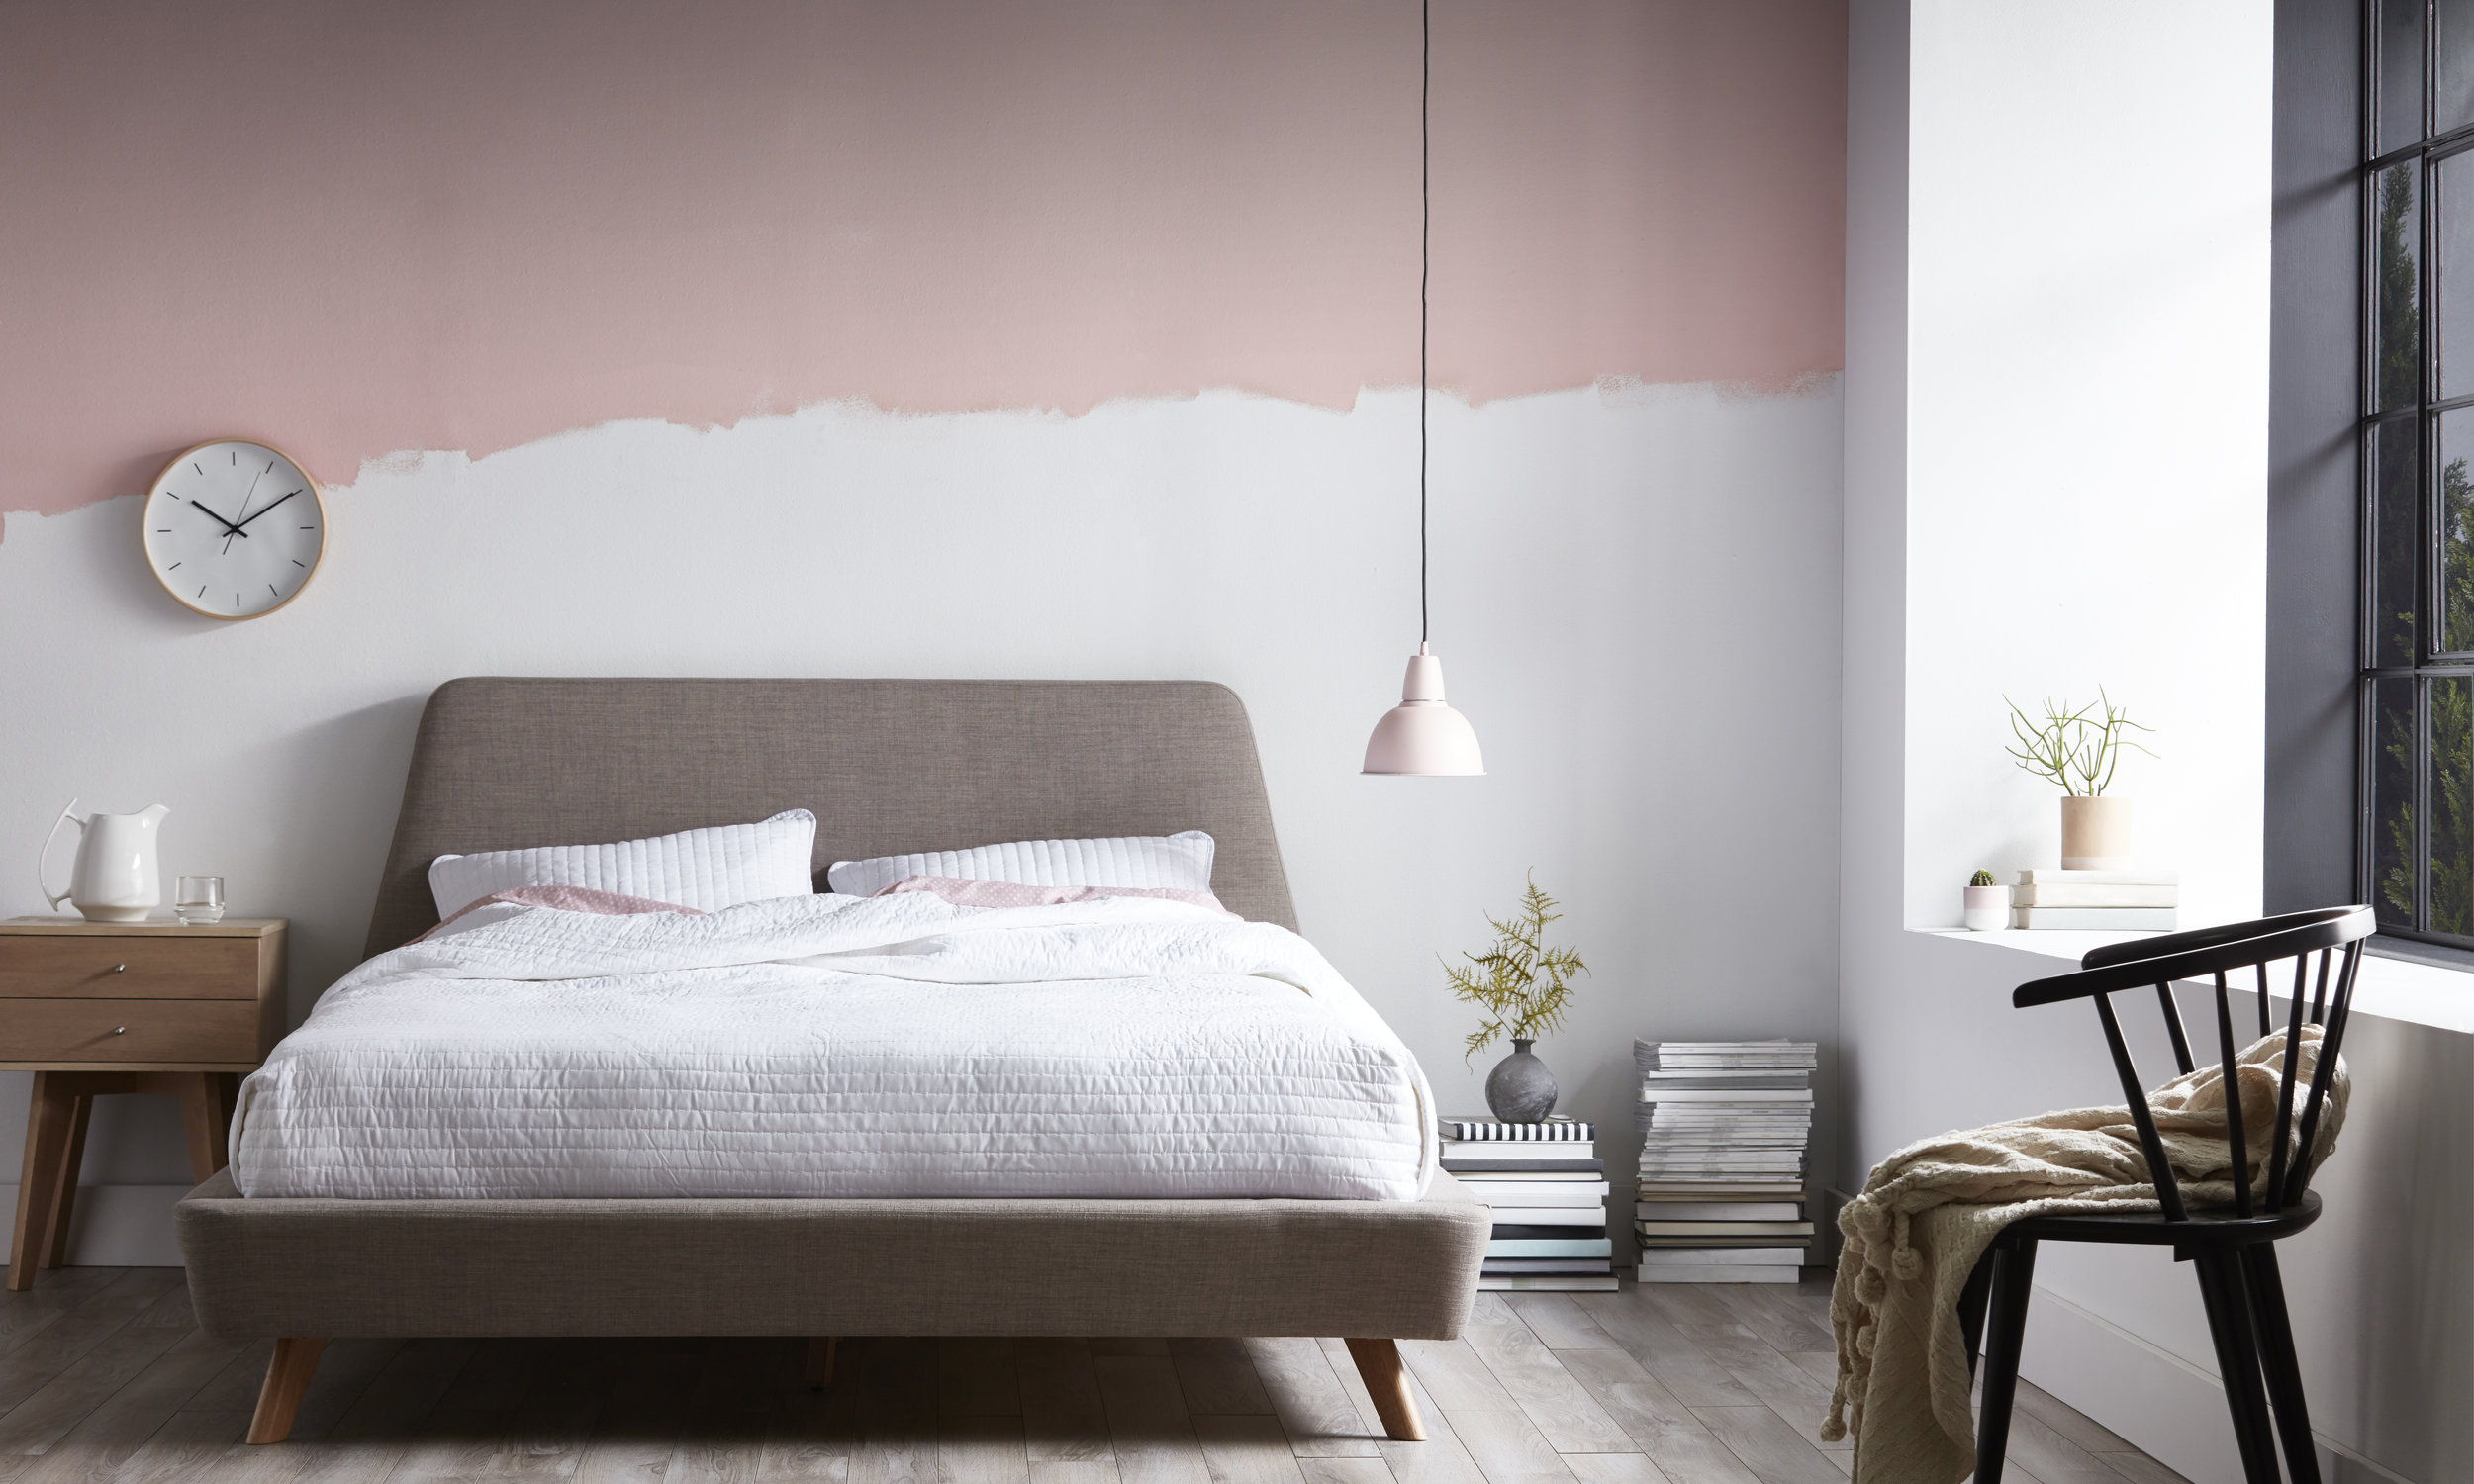 SEO_Scandanavian_Bedroom_1250x750.jpg